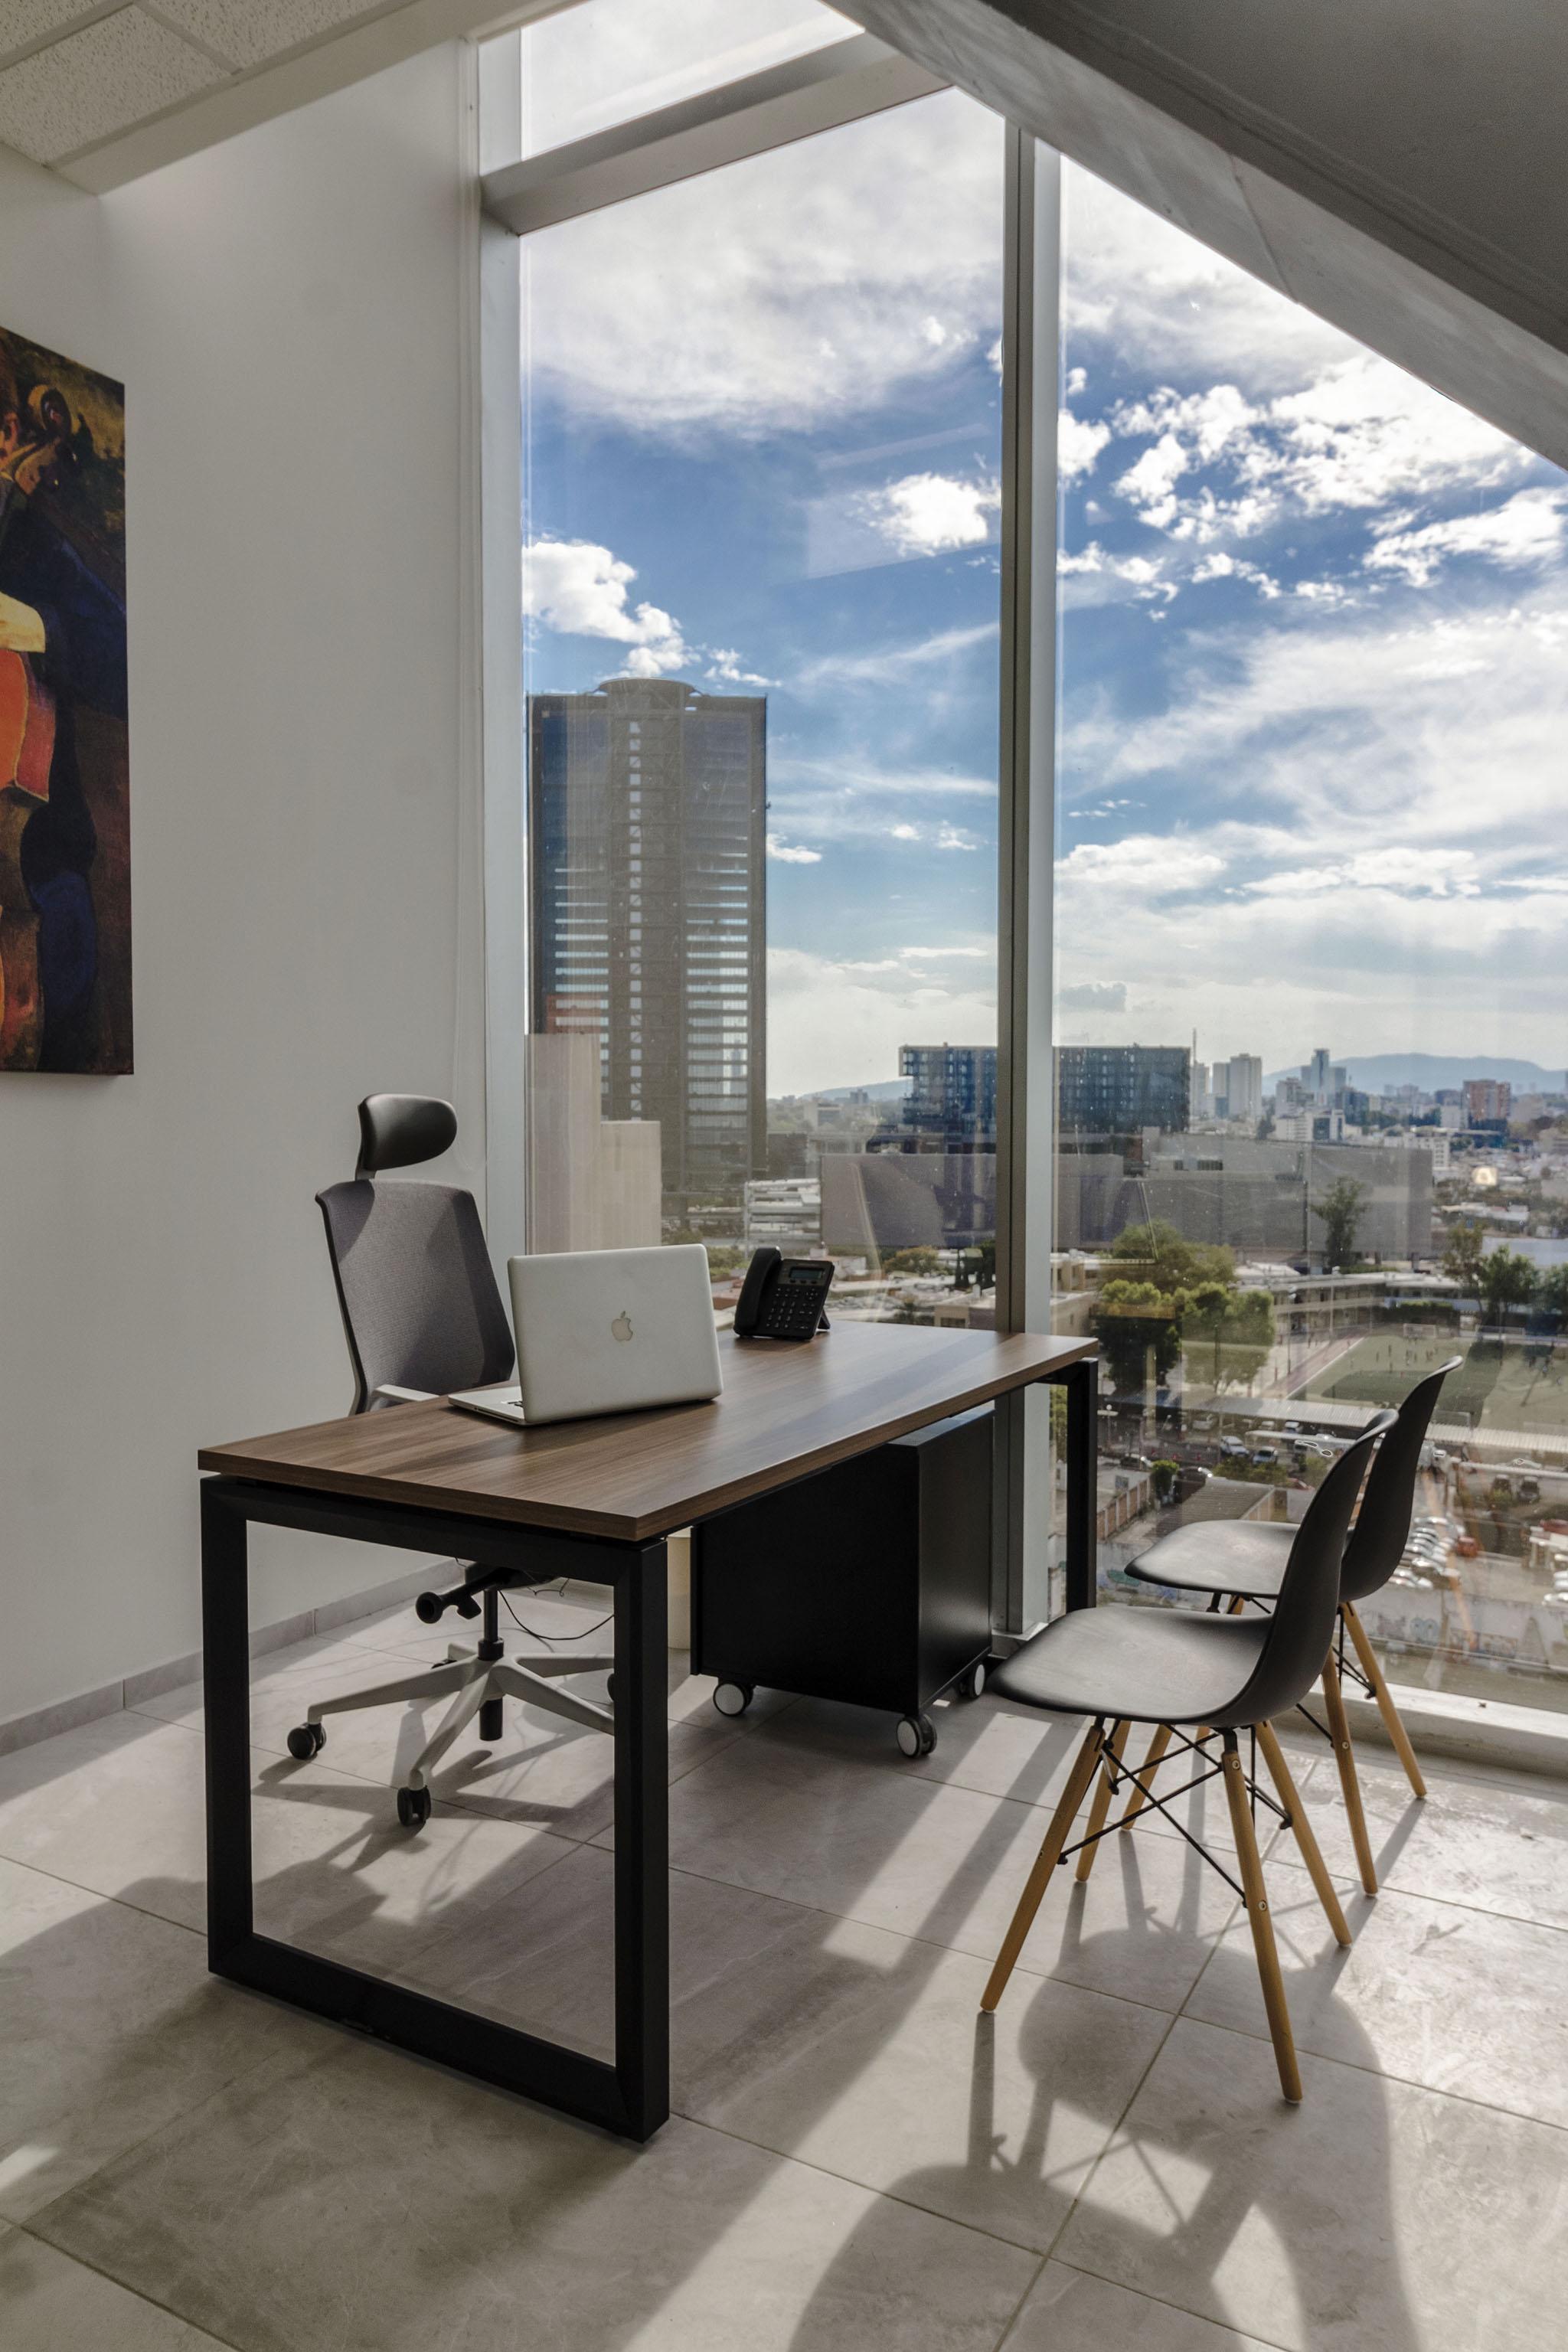 Temporary Guadalajara Office - Meeting Room